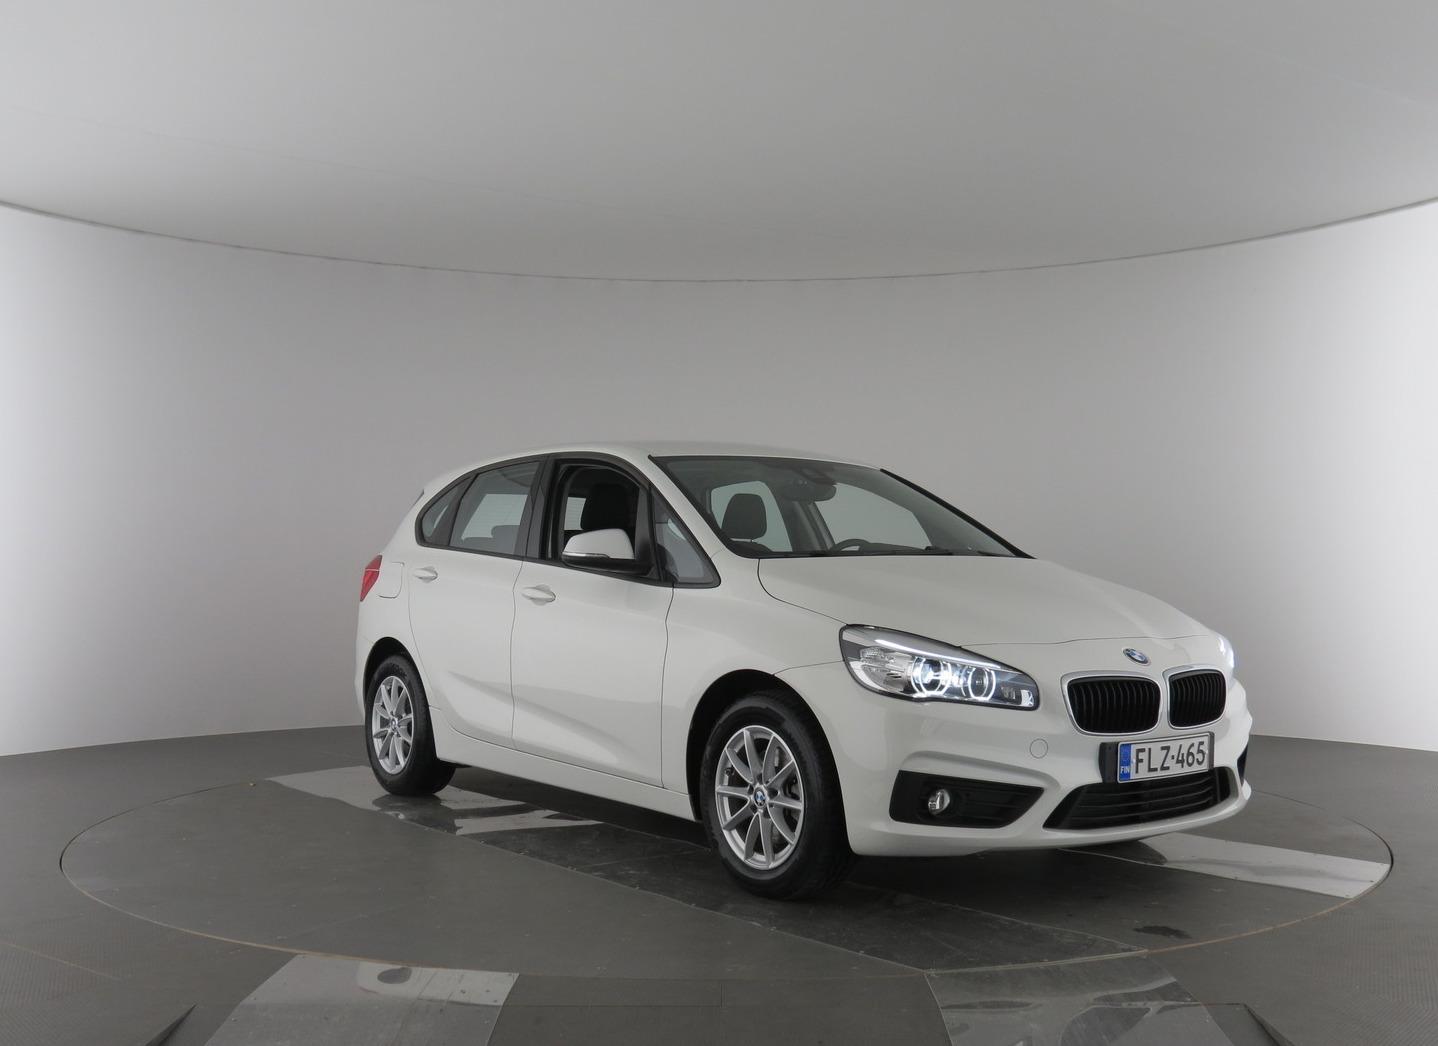 Fiche-occasion-BMW-Serie-2-Active-Tourer-F45-et-Gran-Tourer-F46-8.jpg